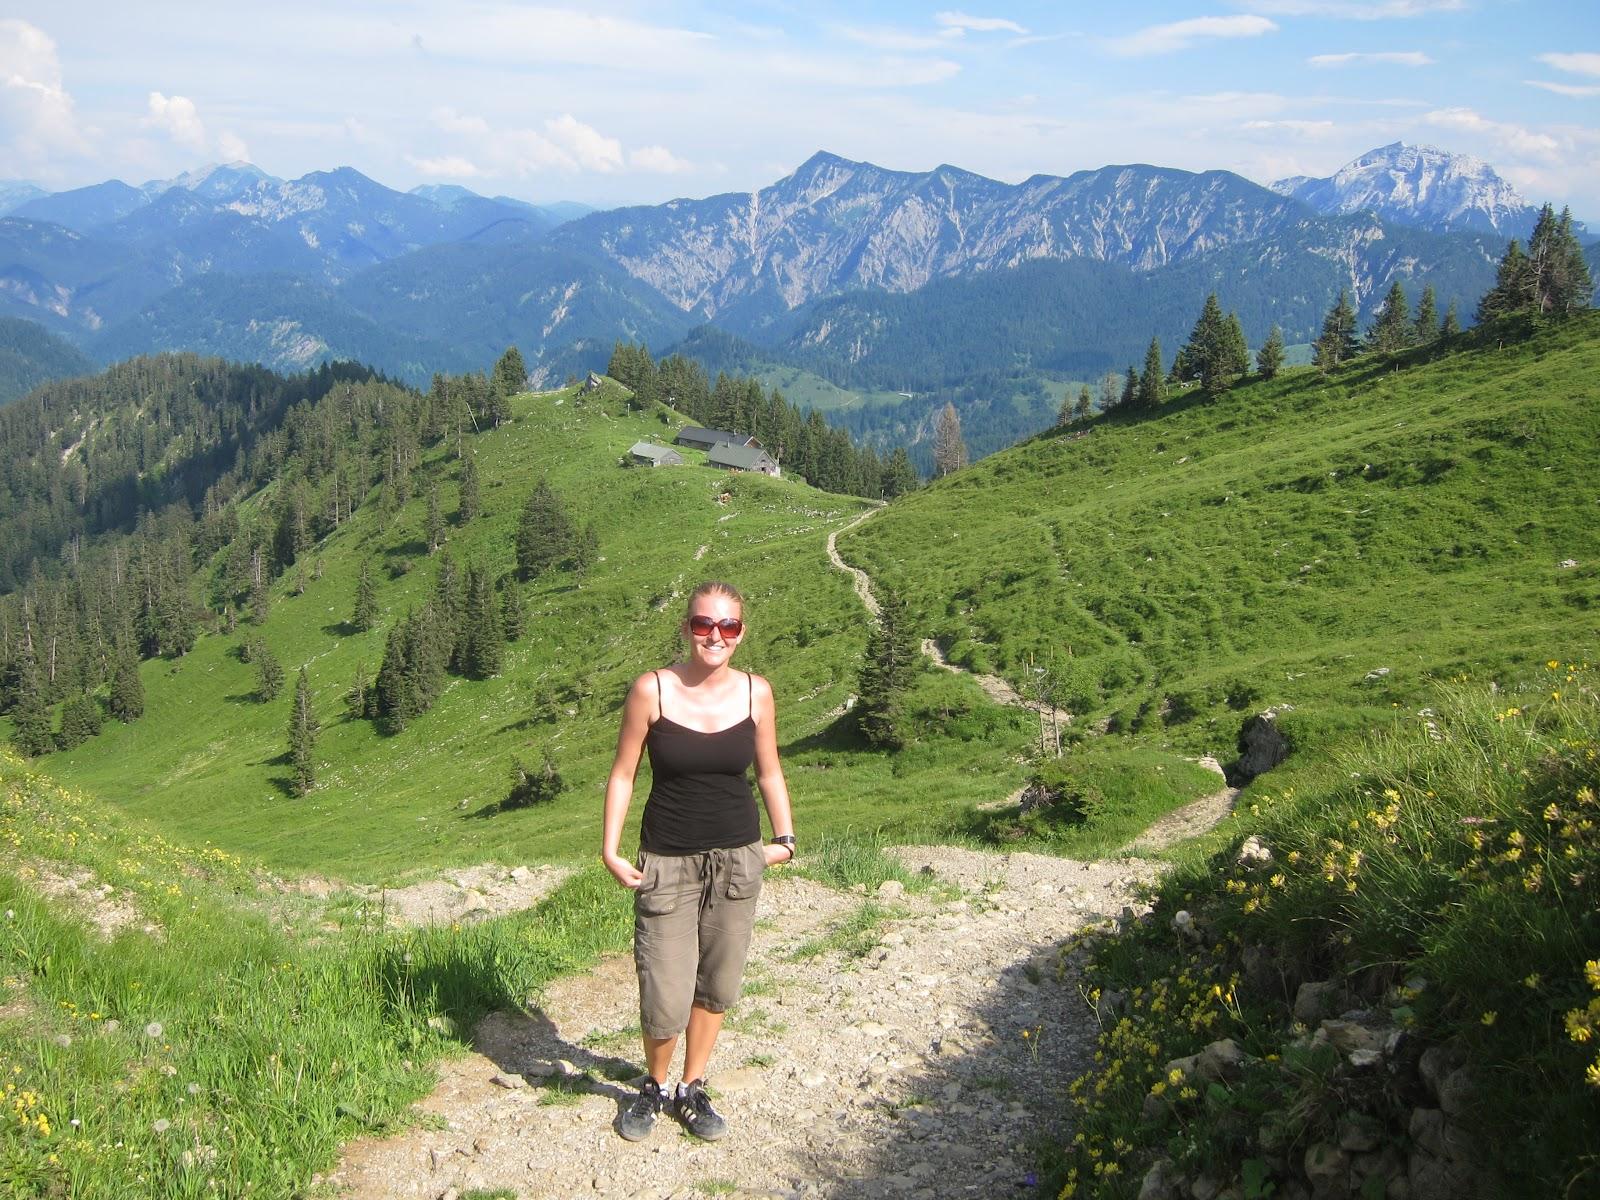 Bavaria – Bavarian Alps Germany | Walking, Hiking, Travel Tips